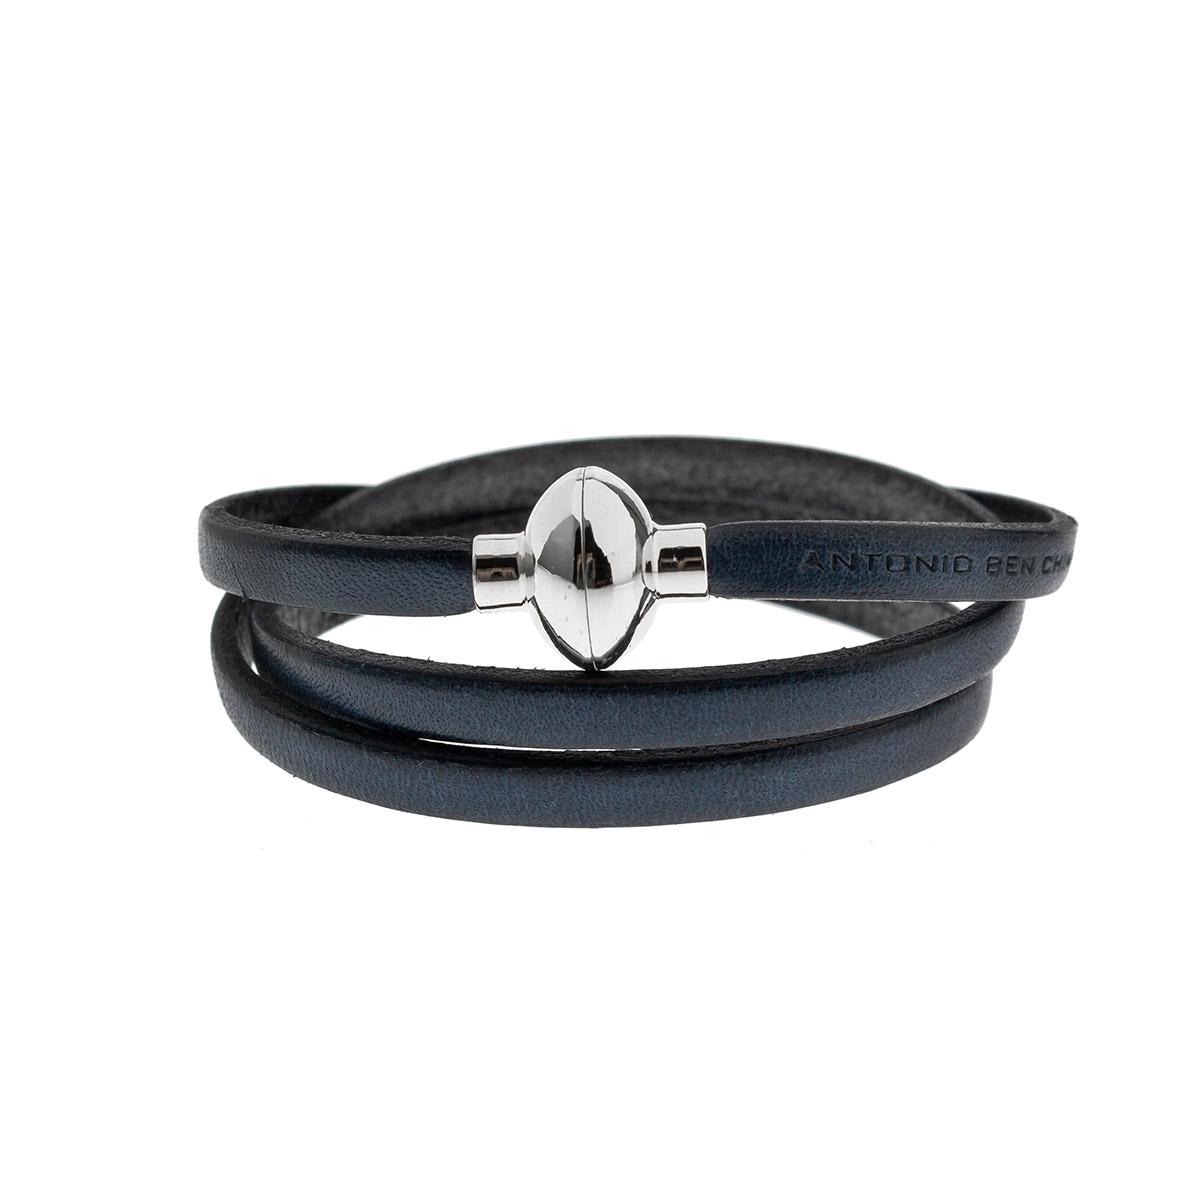 Antonio Ben Chimol Navy Blue Italian Leather Bracelet with Silver Clasp 11_AO_Silver